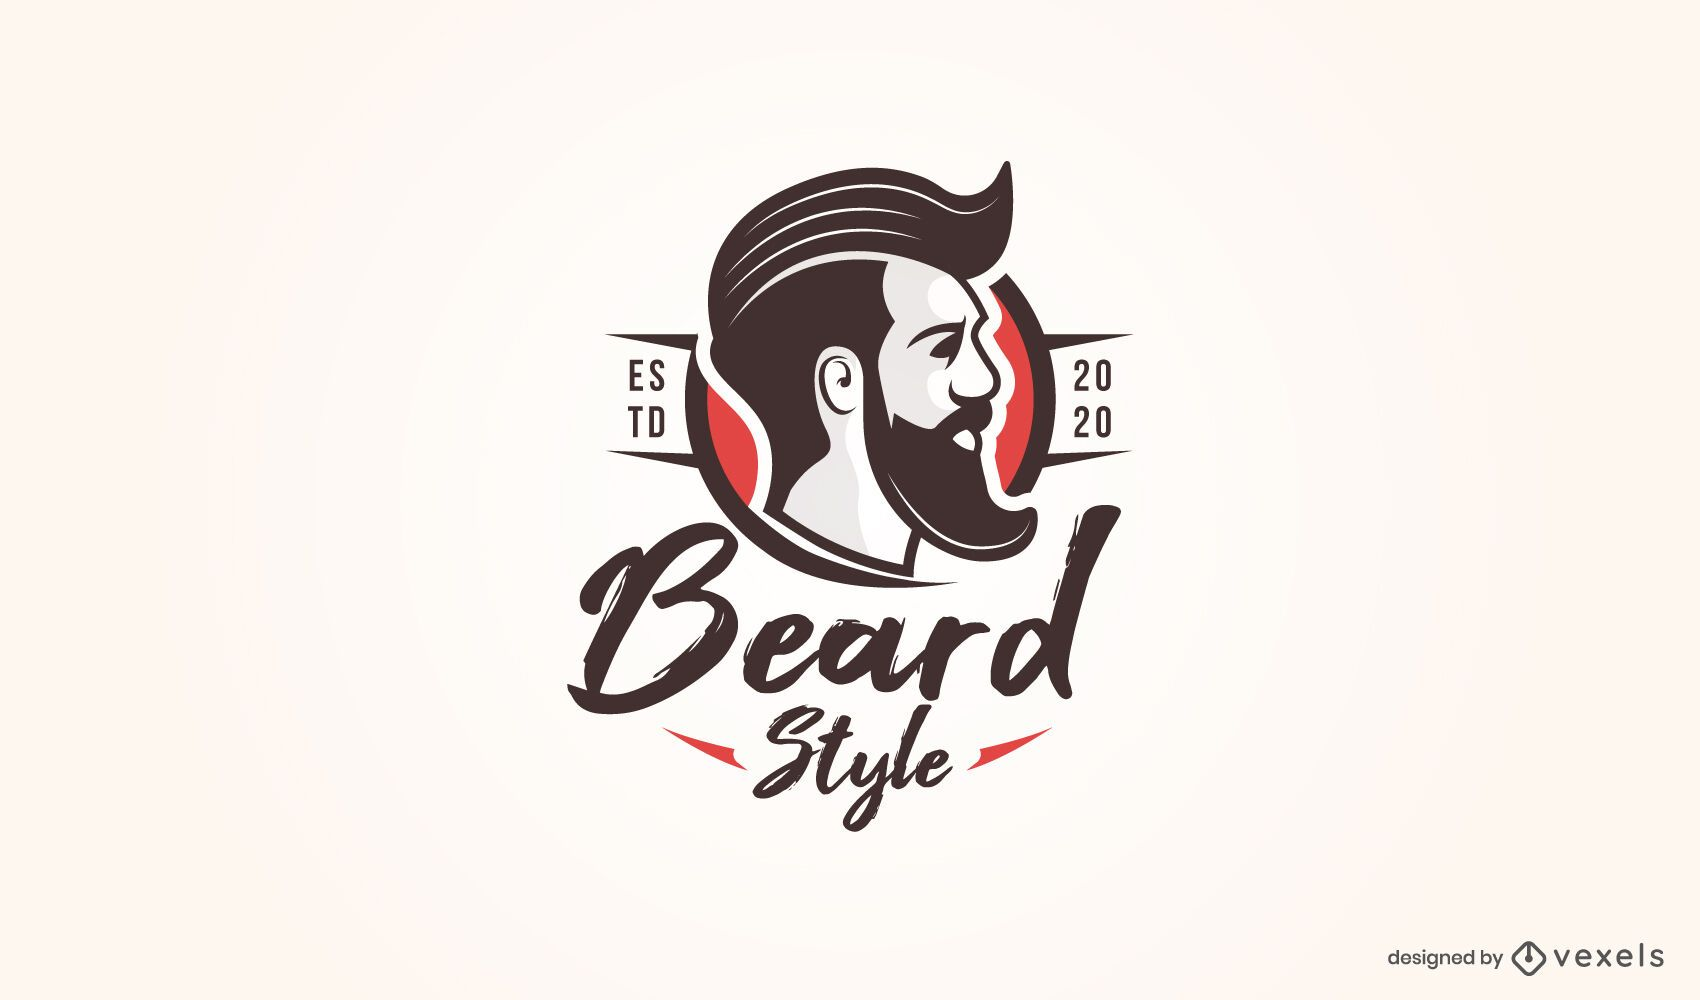 Beard style logo template